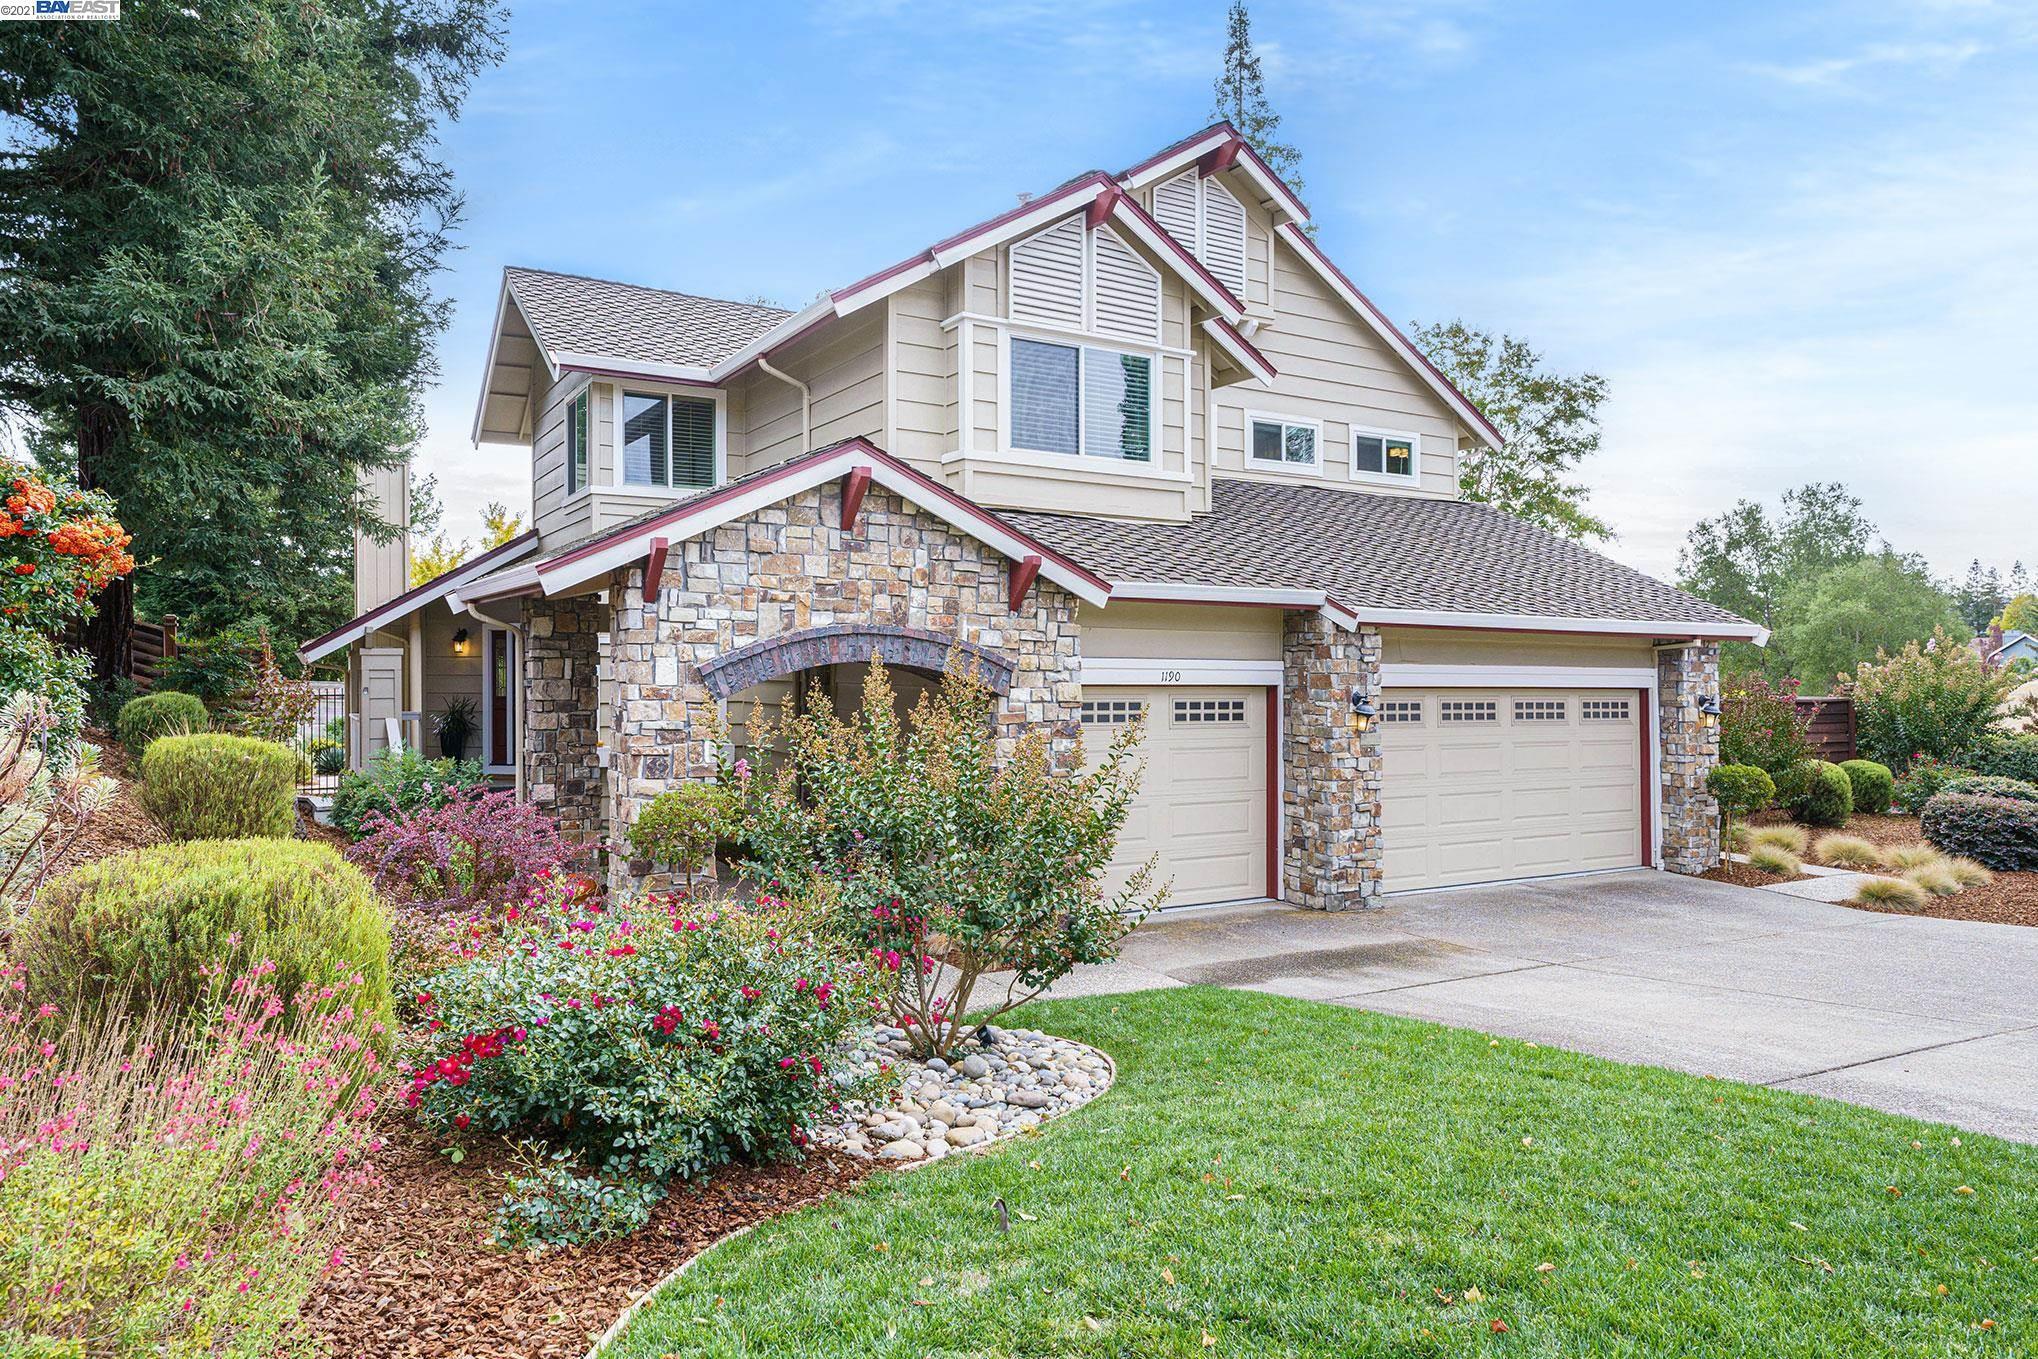 1190 CANYON SIDE AVE, SAN RAMON, CA 94583